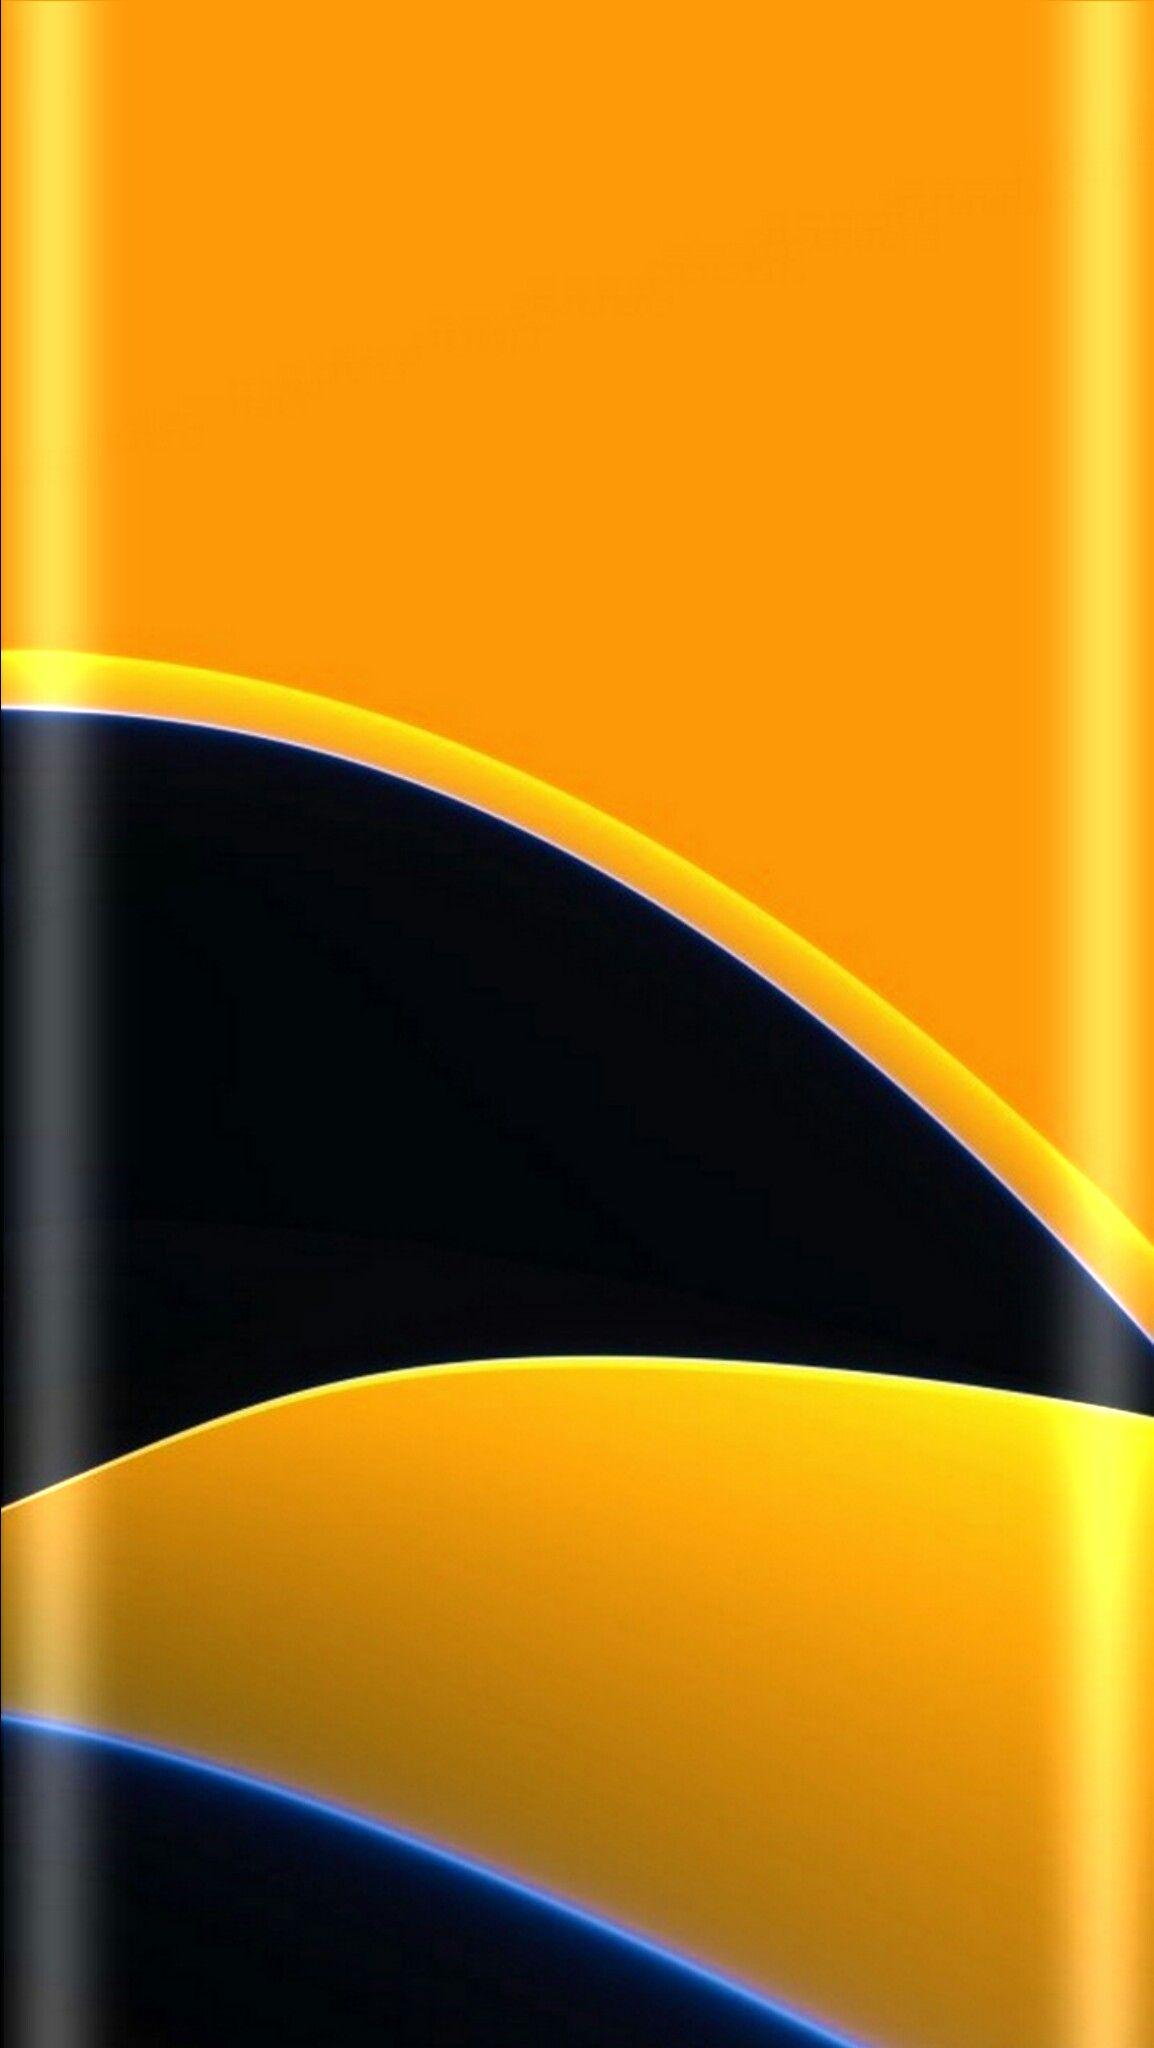 Samsung Iphone Edge Phonetelefon 3d Wallpaper Abstract Iphone Wallpaper Wallpaper Edge Android Wallpaper